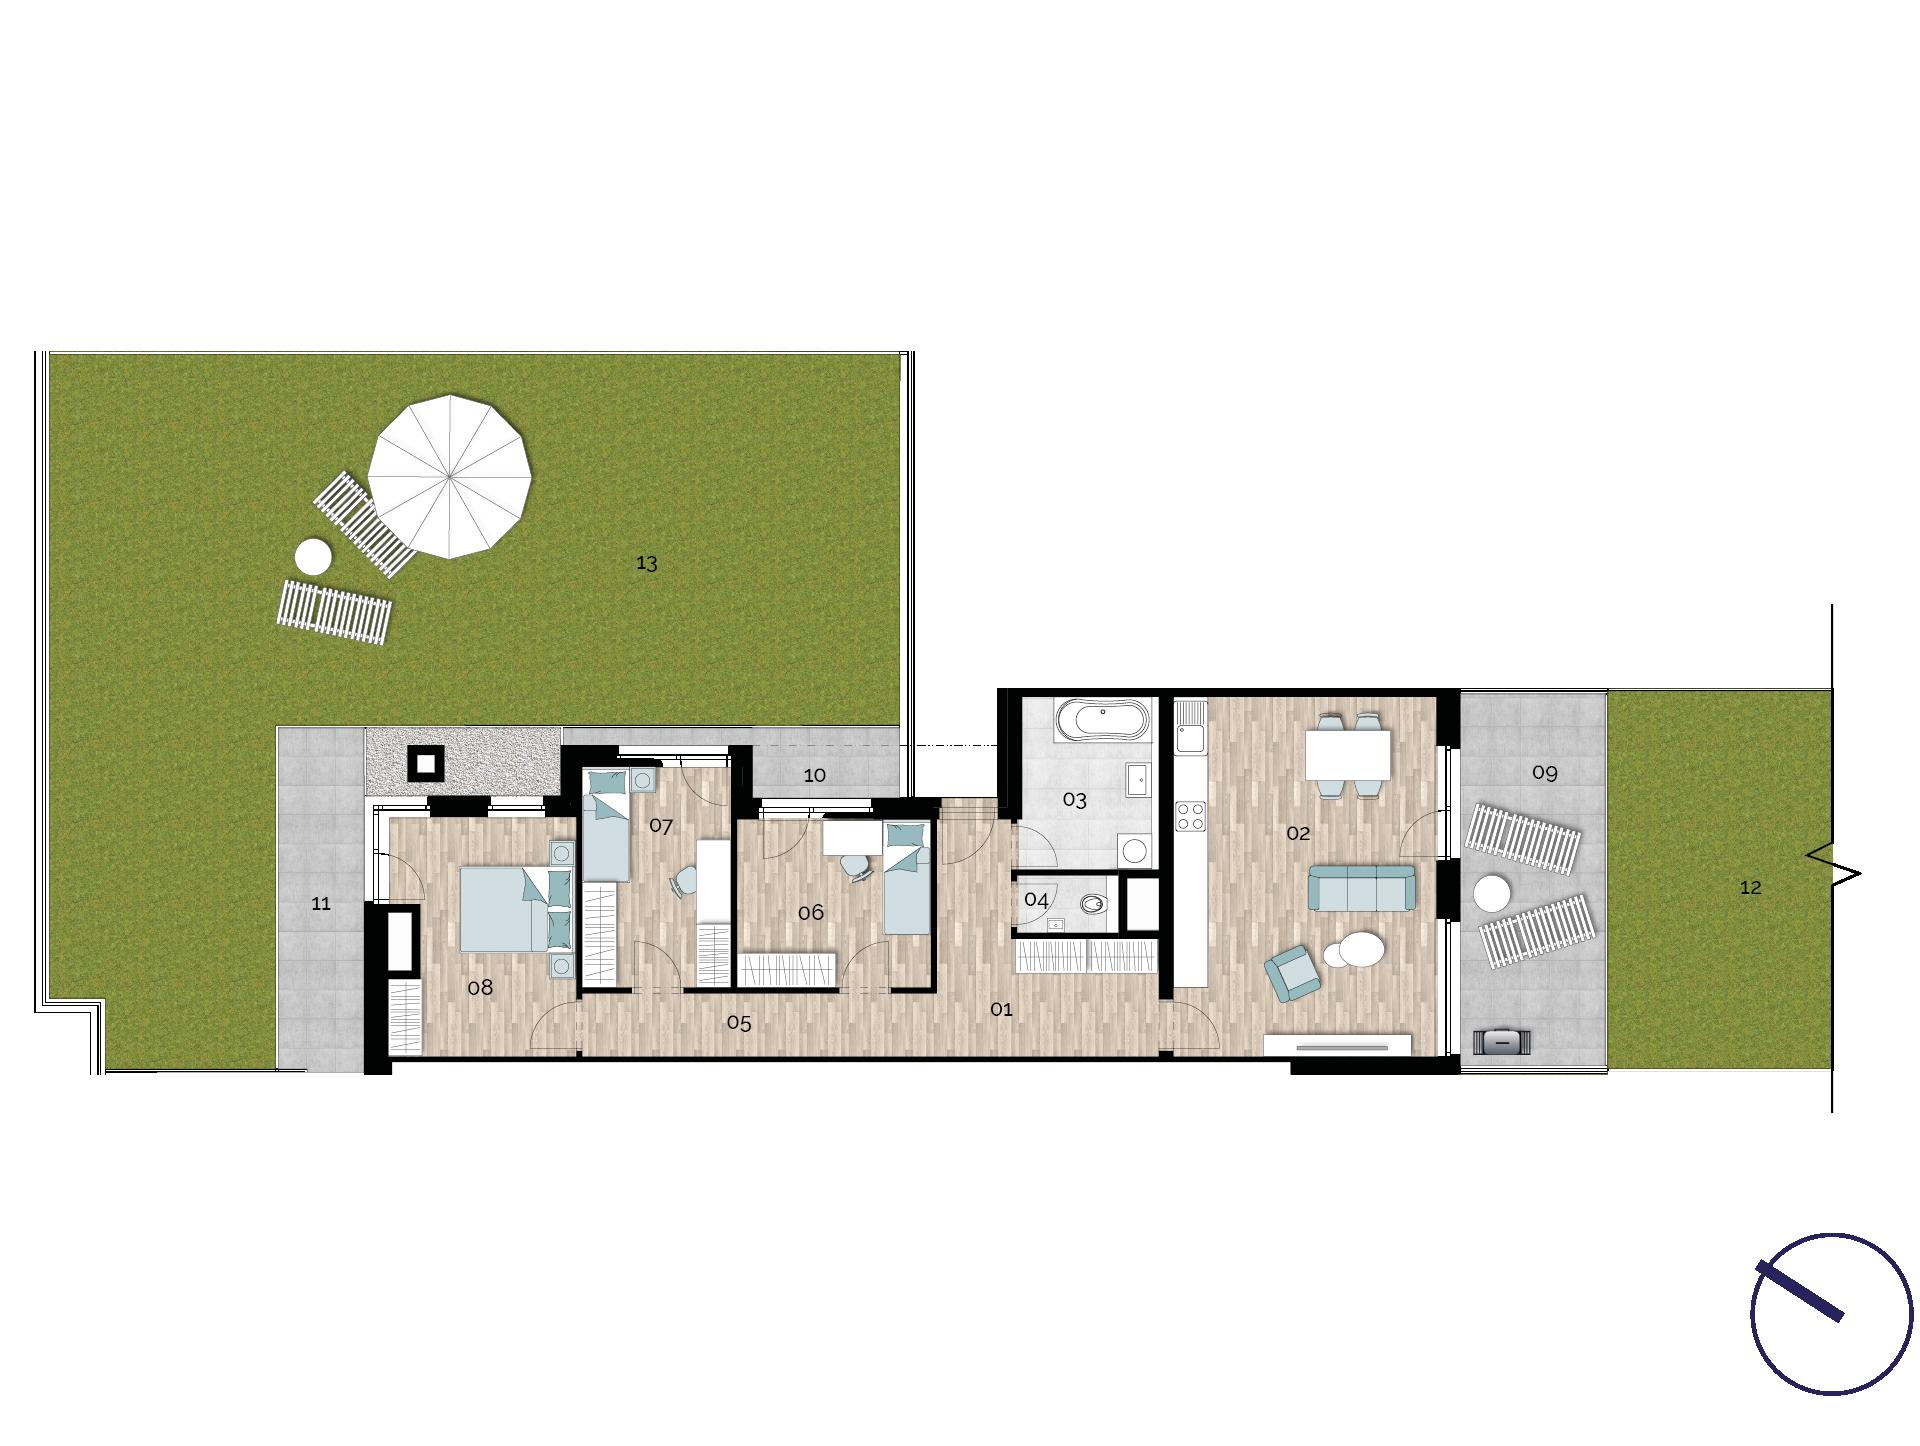 Detail Nemovitosti - Rezidence U Rokytky, Praha 9 1B7 / 1. NP